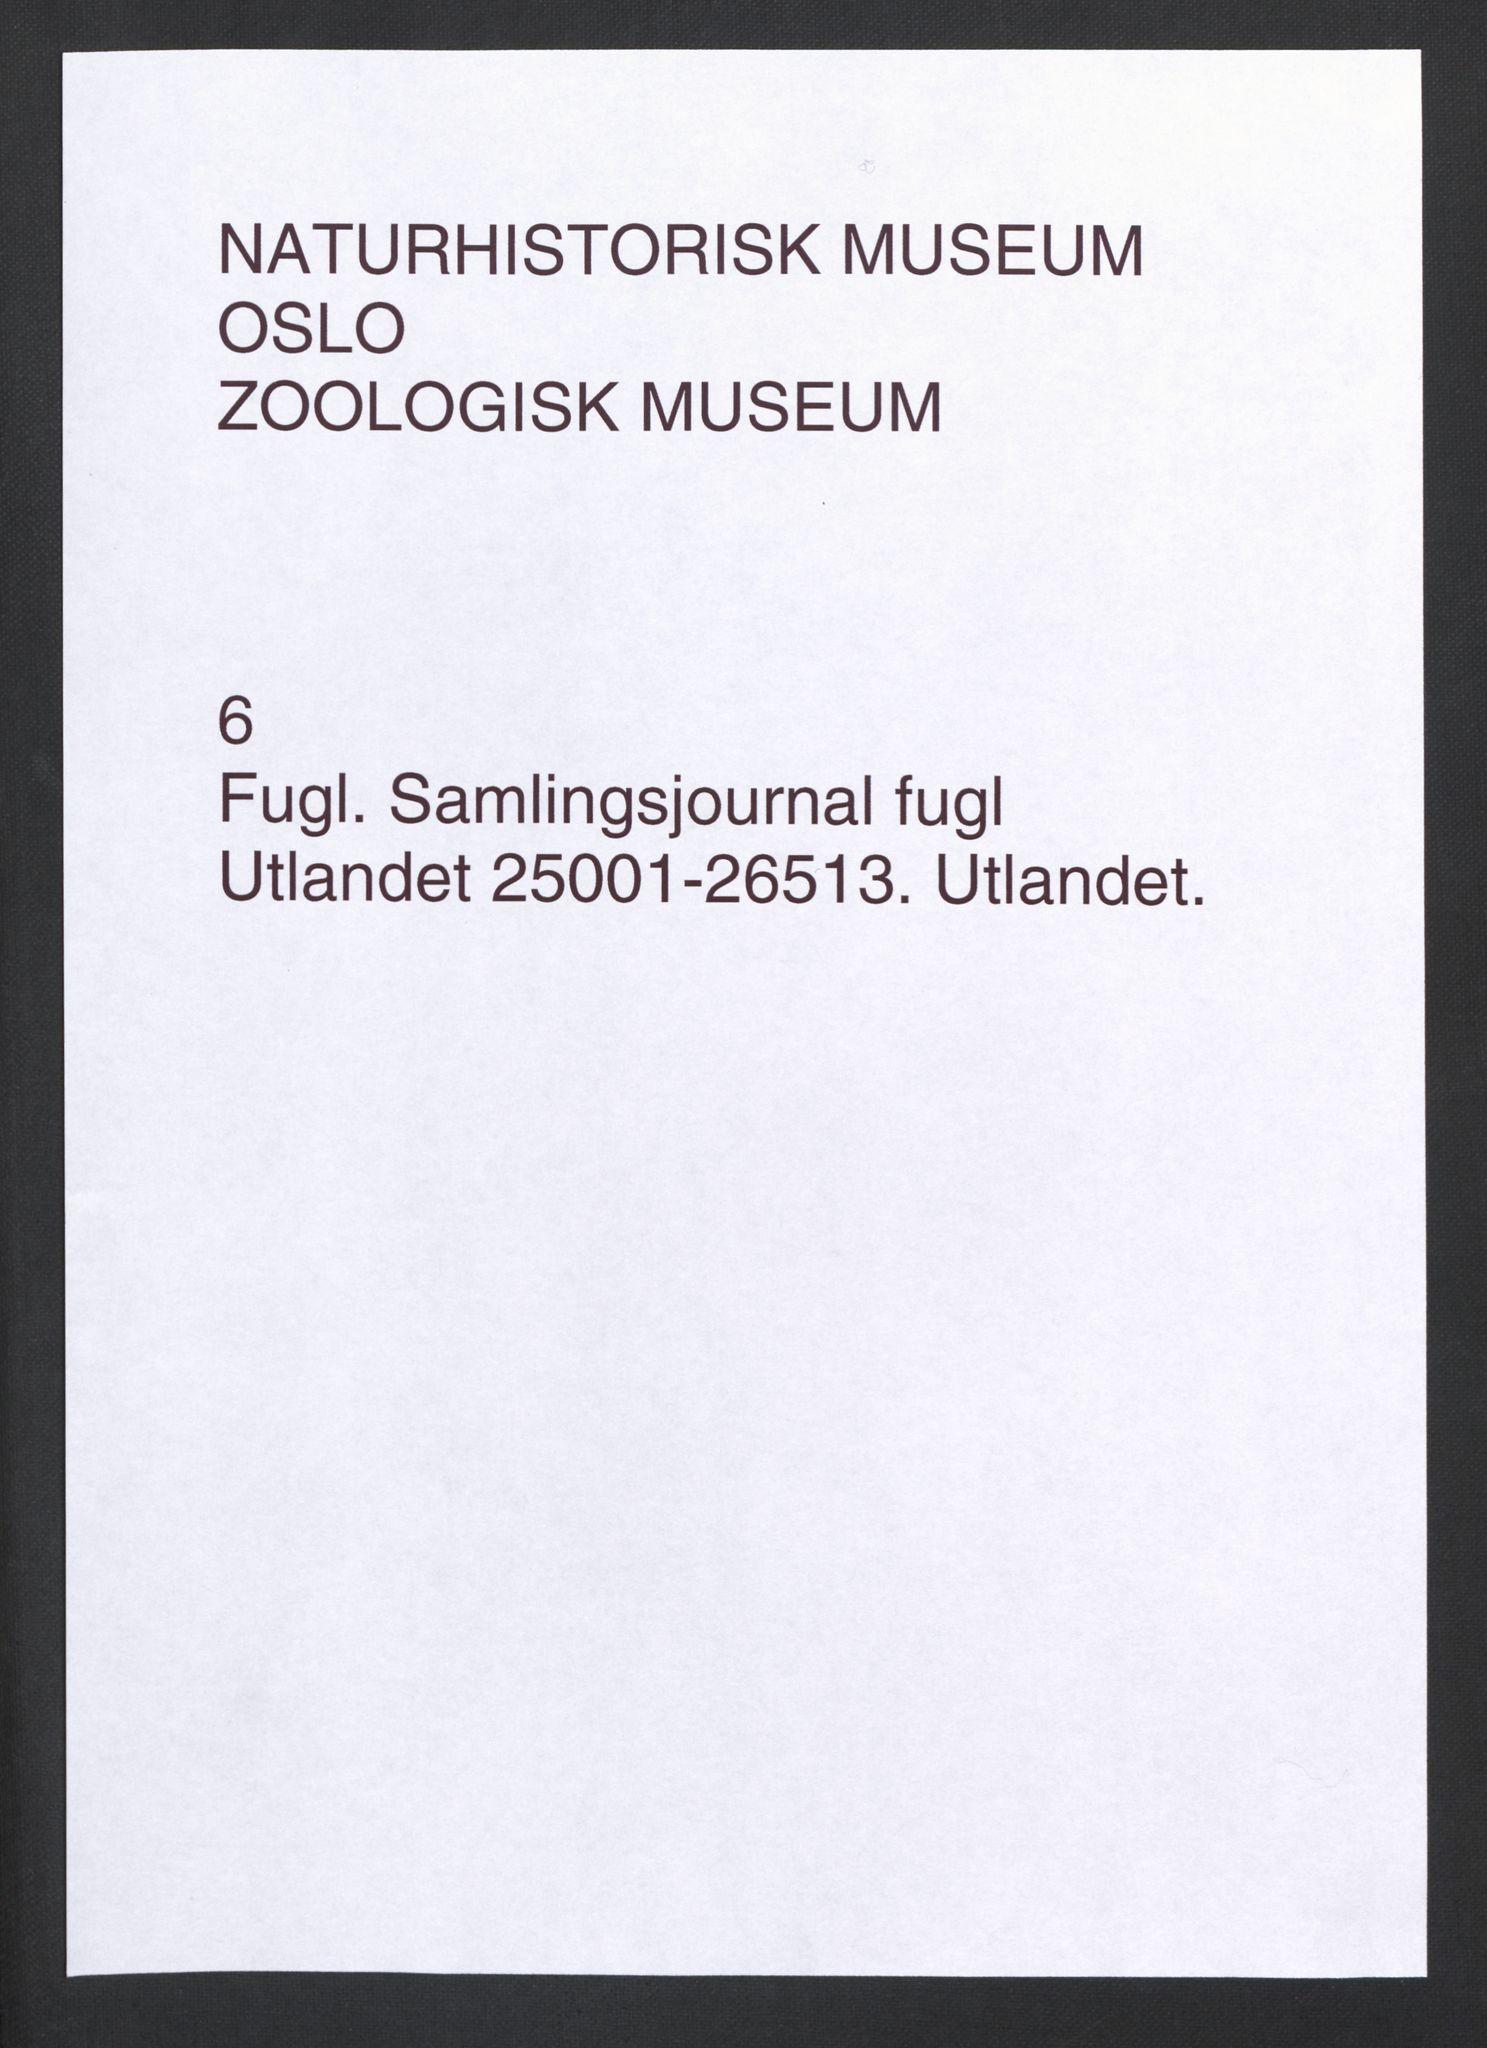 NHMO, Naturhistorisk museum (Oslo), 2: Fugl. Samlingsjournal. Fuglesamlingen, Skinnsamling Utlandet (L), nr. 25001-26513.